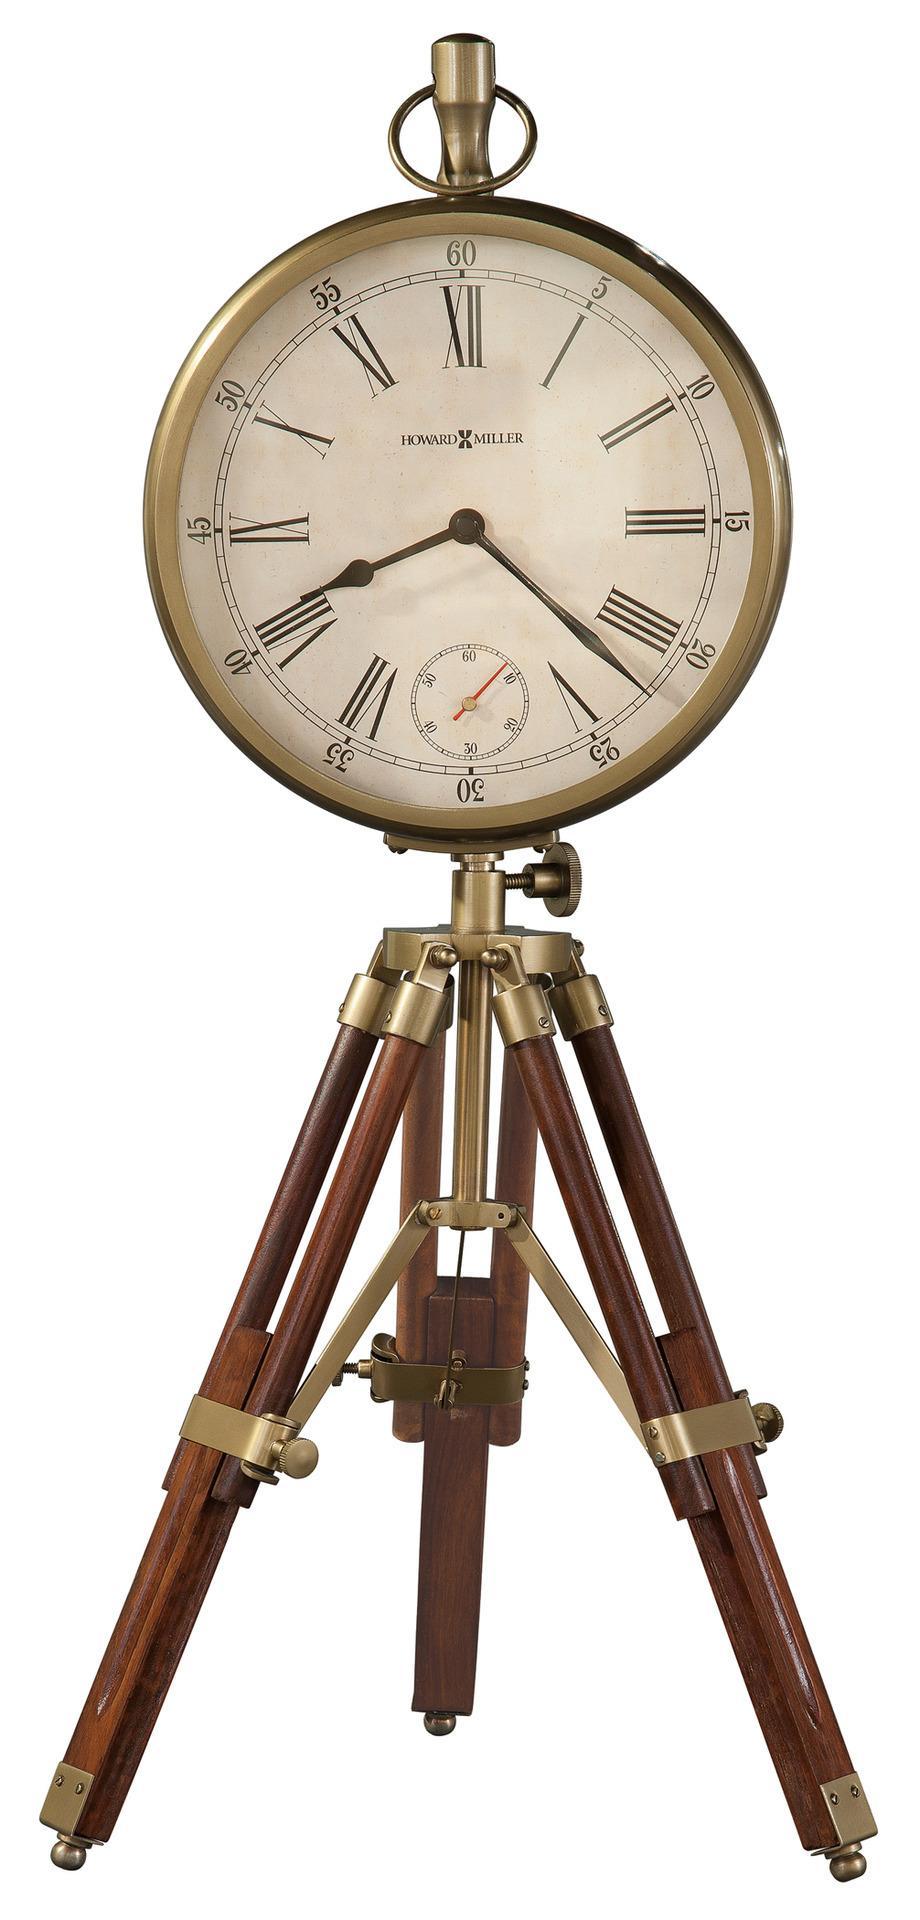 Howard Miller 635-192 Time Surveyor Mantel  - фото 1